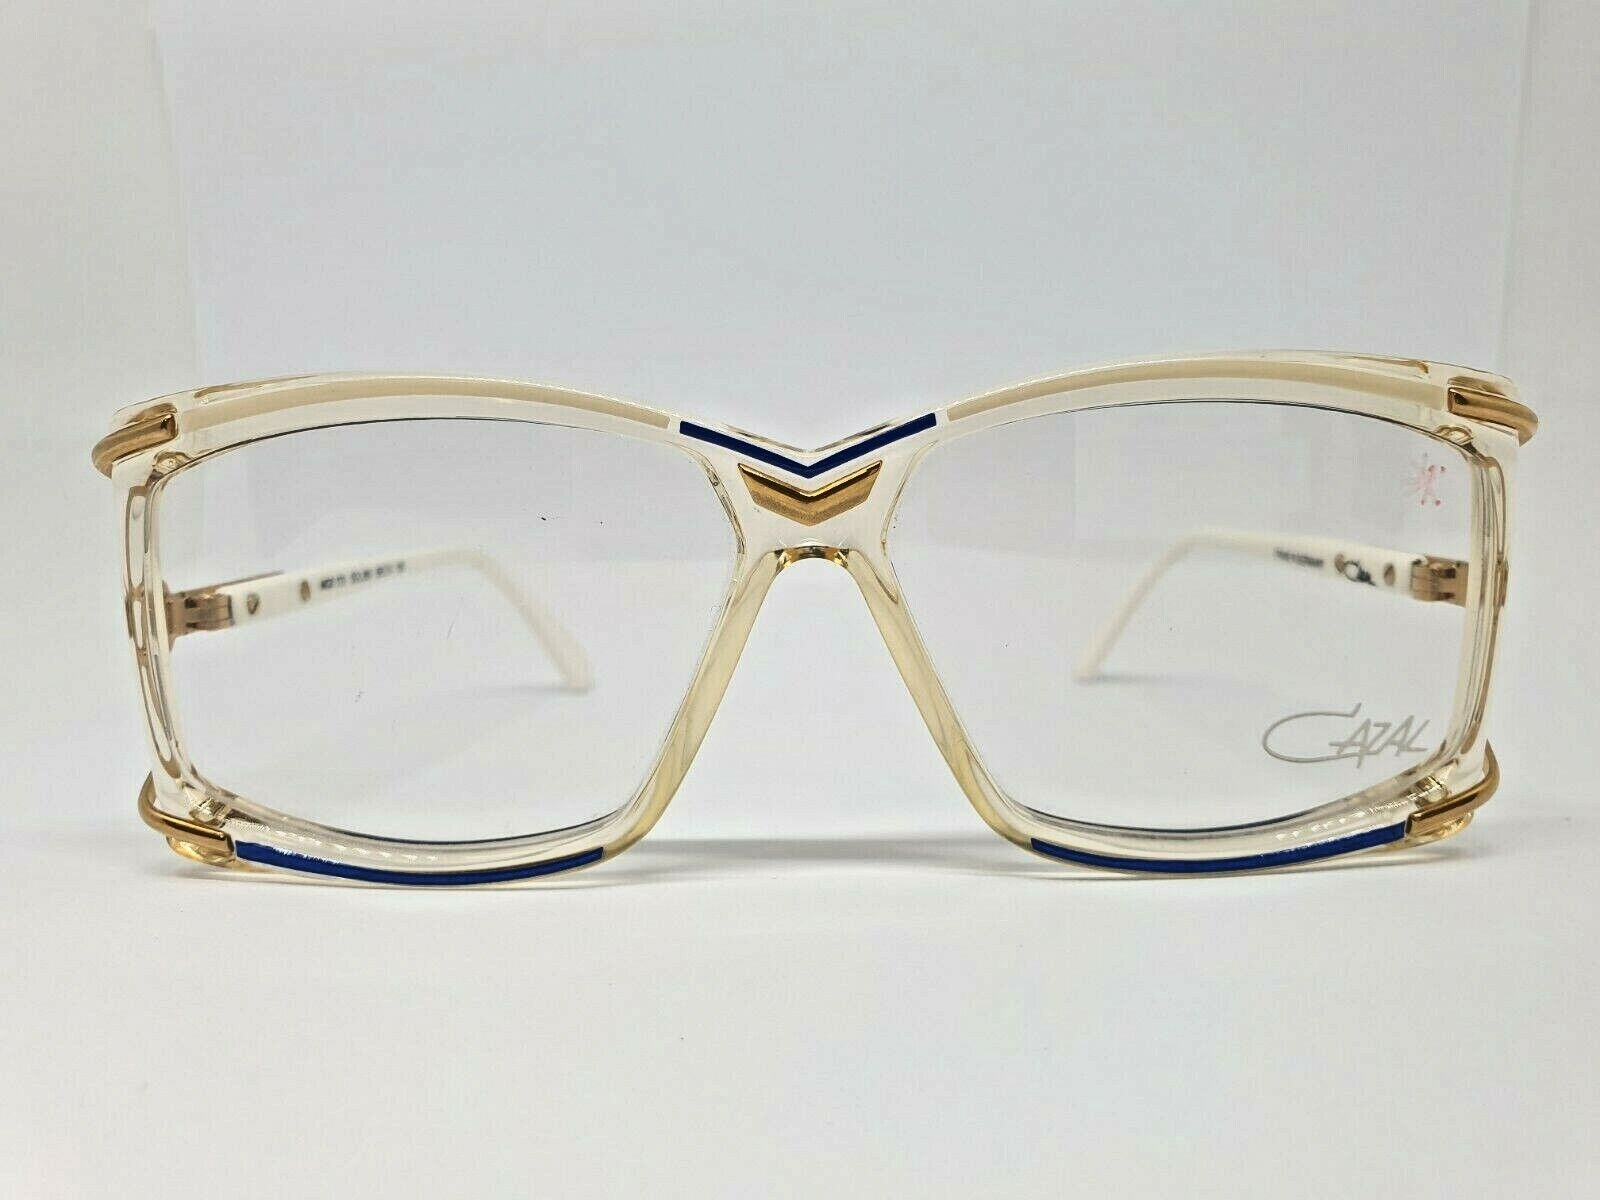 CAZAL 179 - Vintage Eyeglasses - 1970/80's - New Old Stock - Collectible